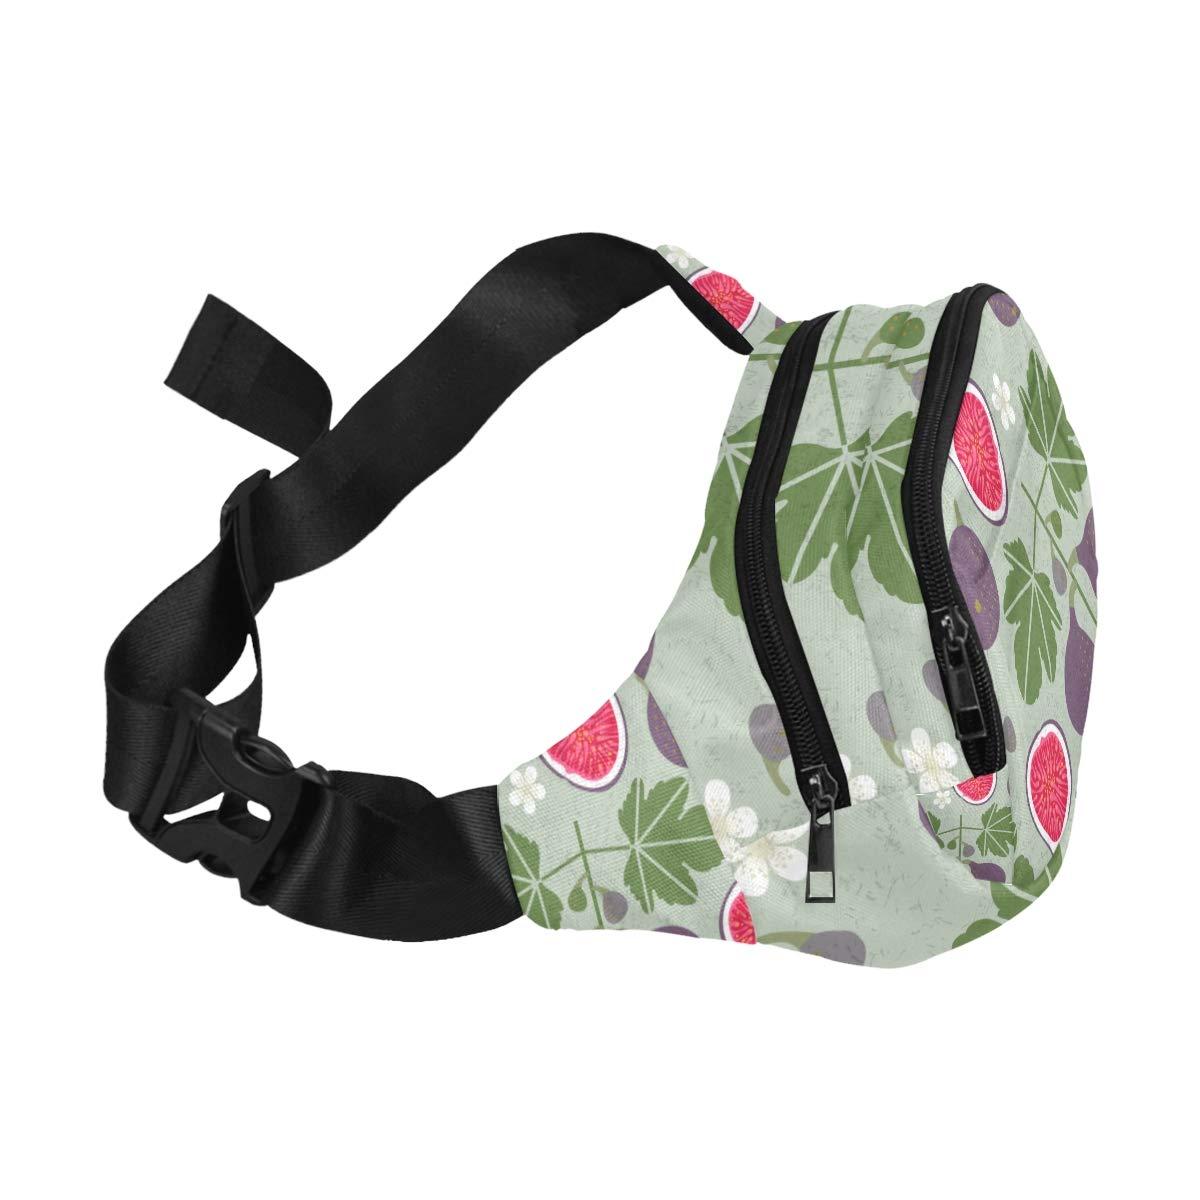 Delicious Fruit Flavor Of Fig Leaves Fenny Packs Waist Bags Adjustable Belt Waterproof Nylon Travel Running Sport Vacation Party For Men Women Boys Girls Kids